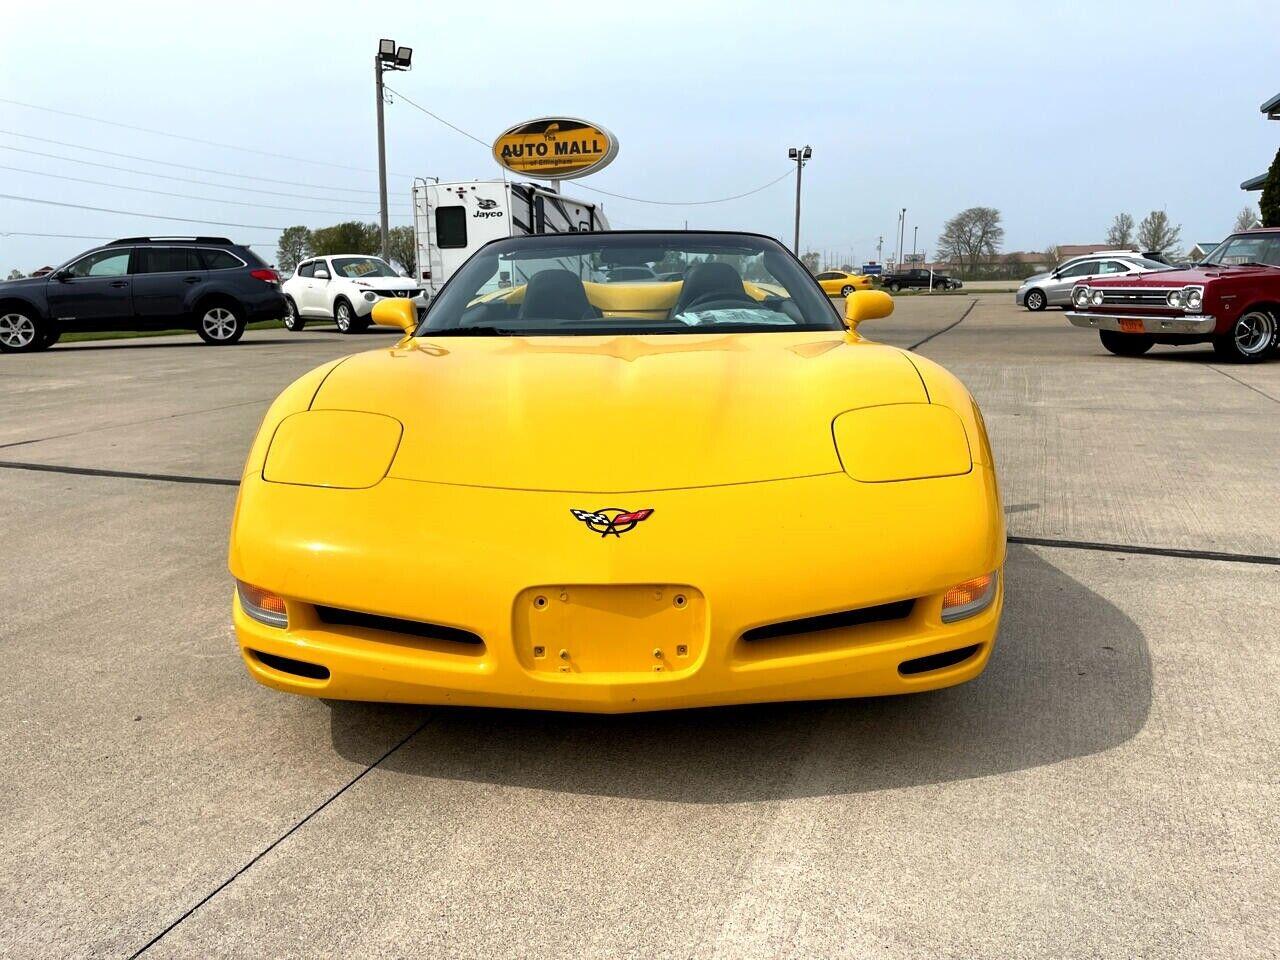 2004 Yellow Chevrolet Corvette Convertible    C5 Corvette Photo 2